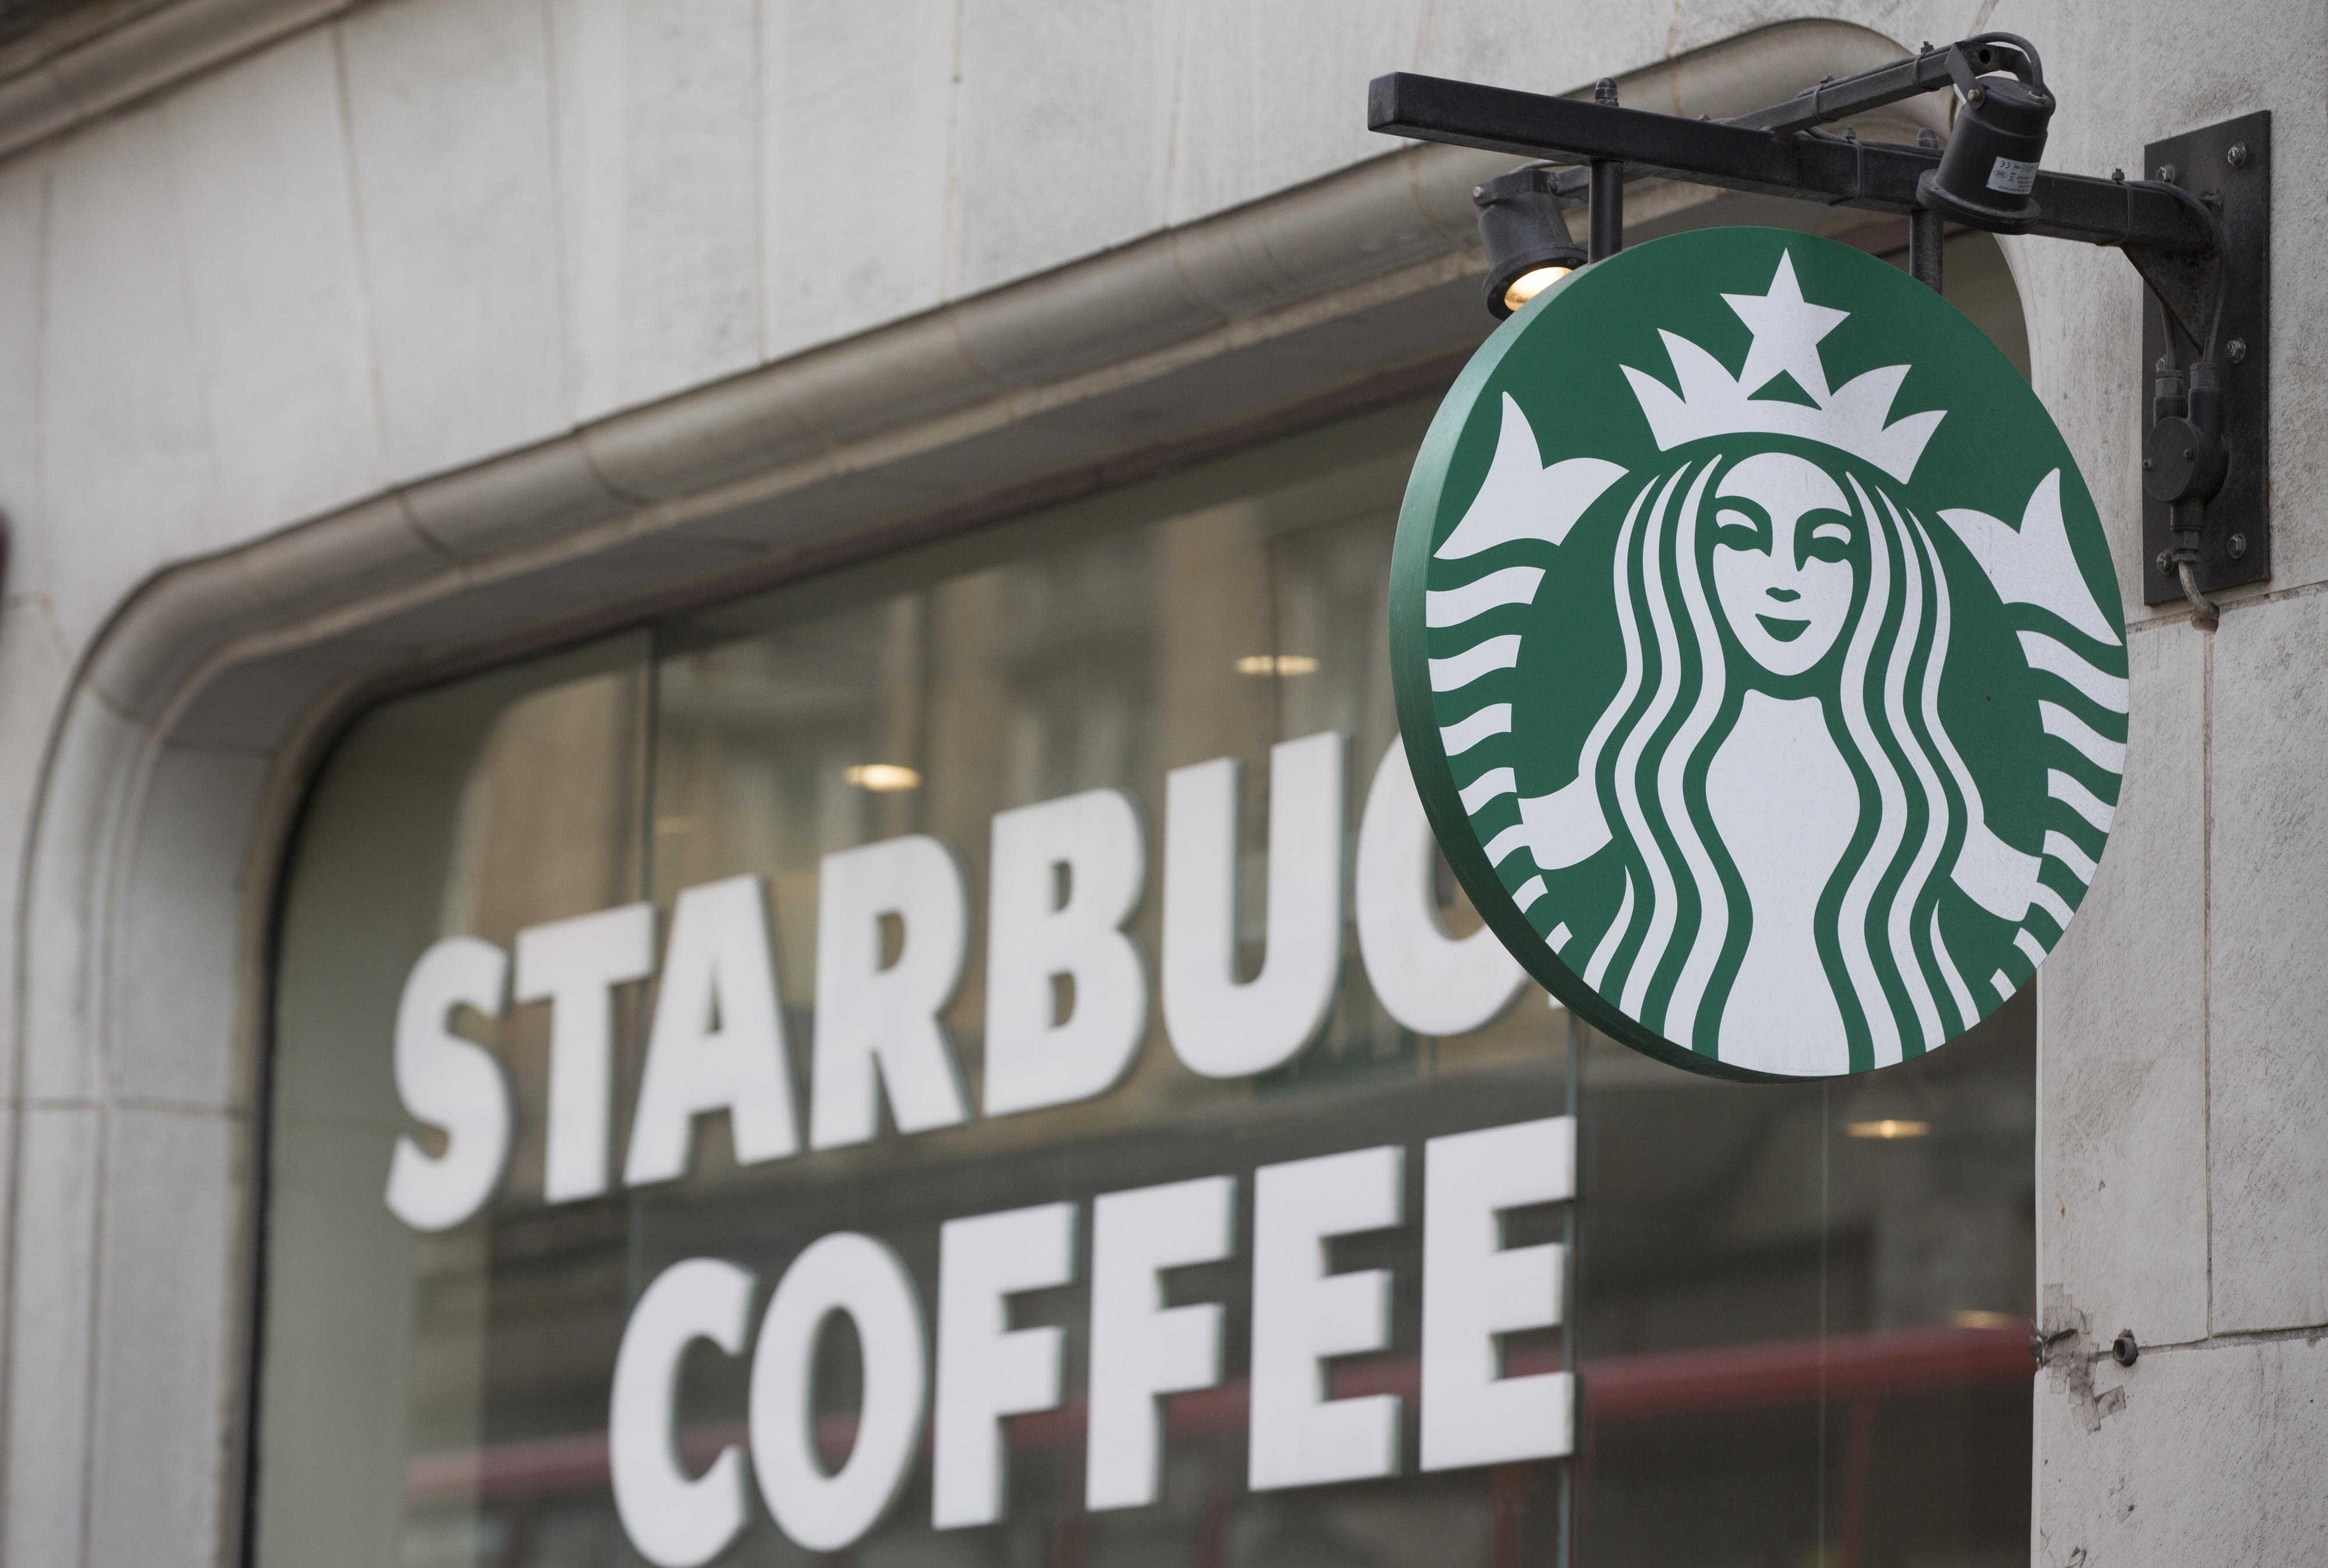 The Starbucks Corp. logo hangs outside of a coffee shop in London, U.K., on Monday, June 9, 2014.